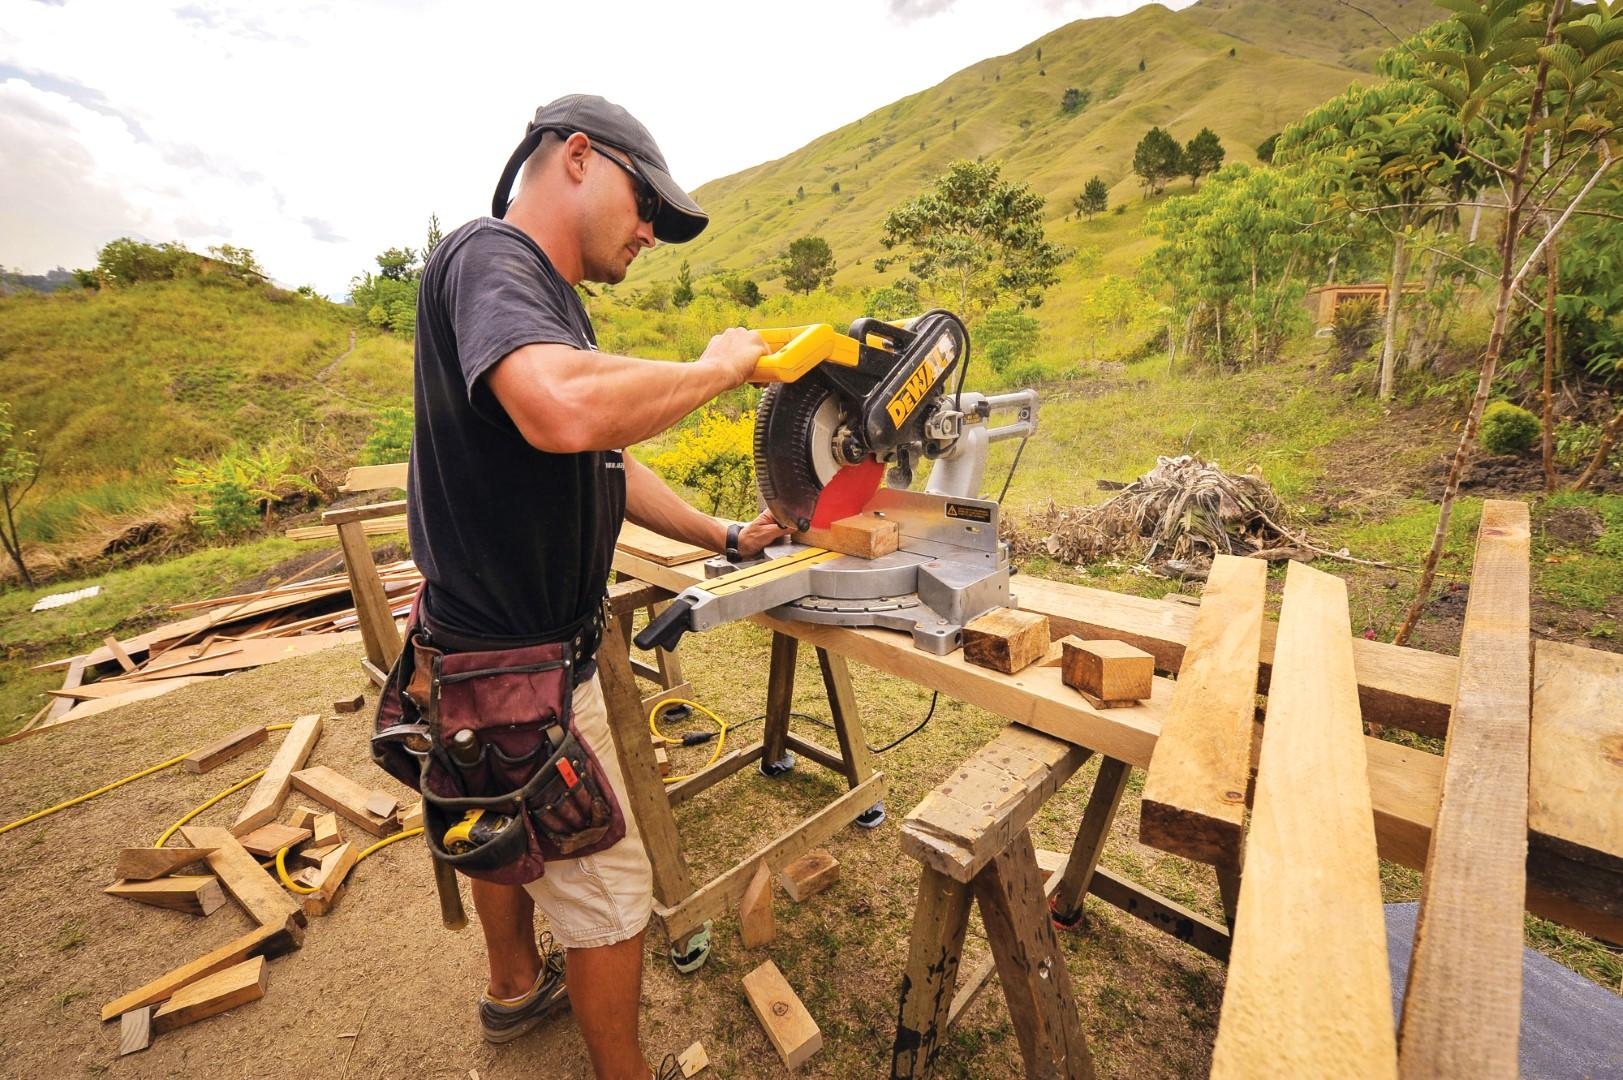 Serving as a carpenter